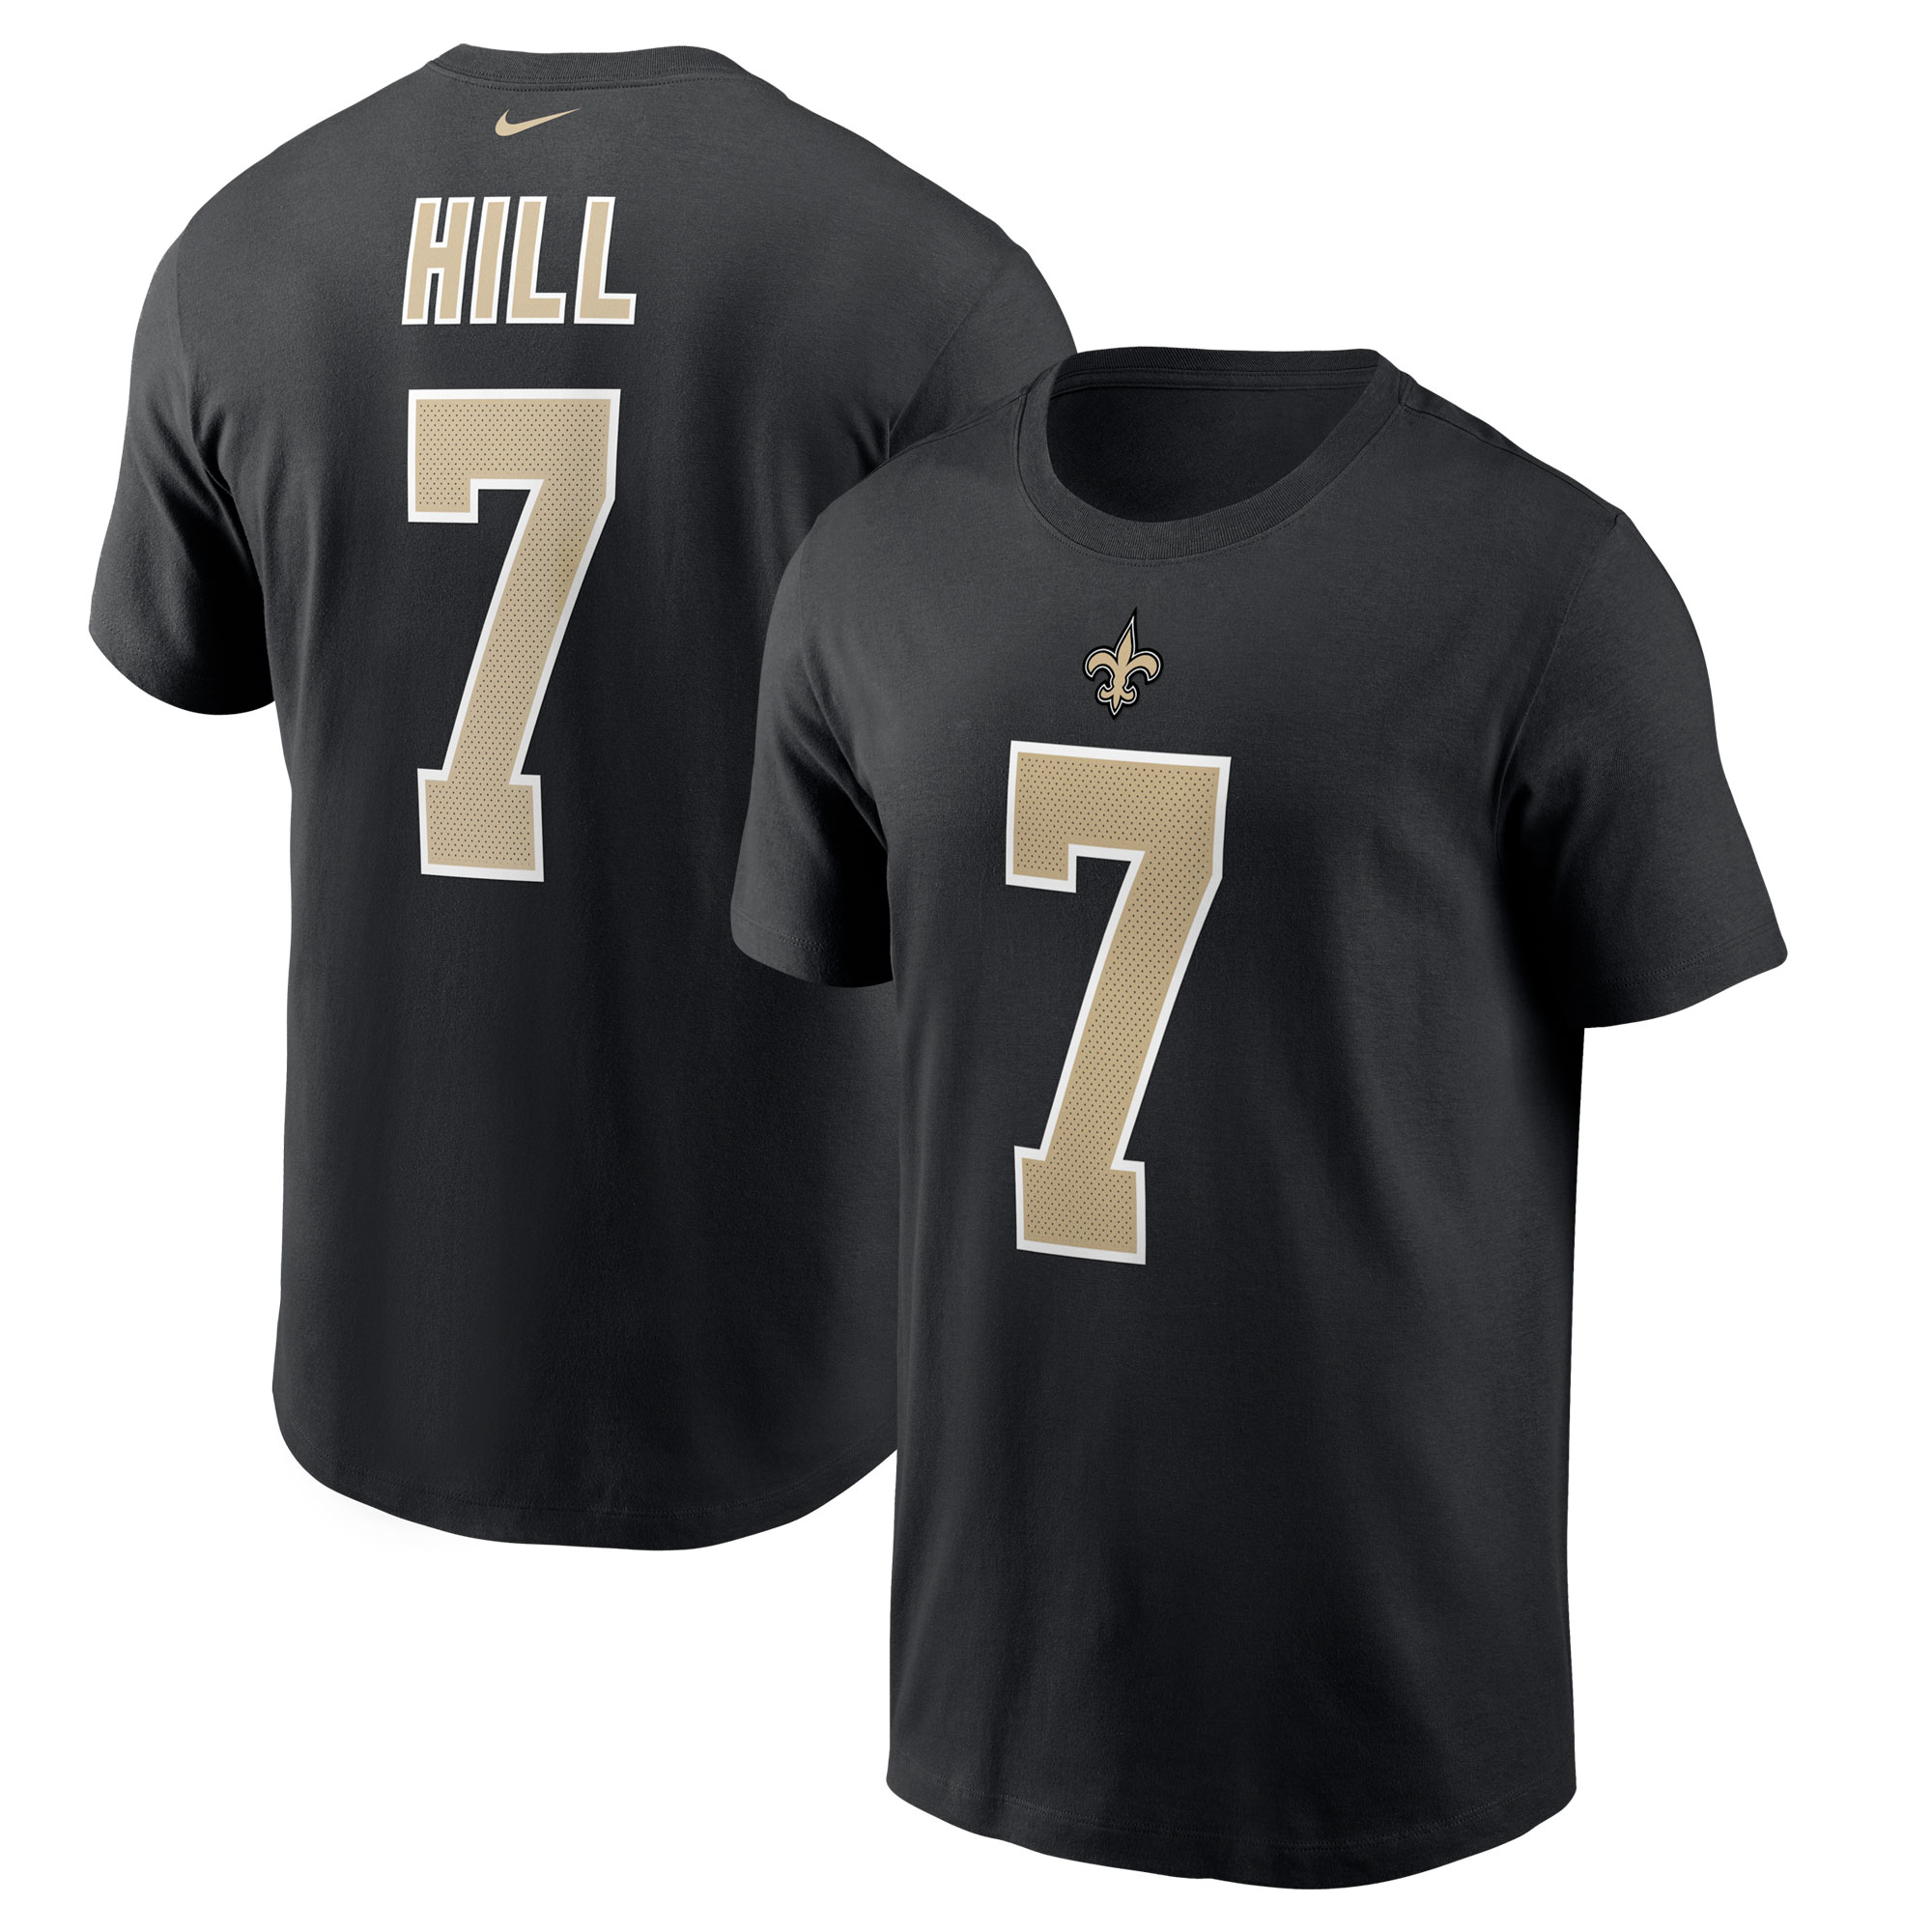 Taysom Hill New Orleans Saints Nike Player Name & Number T-Shirt - Black